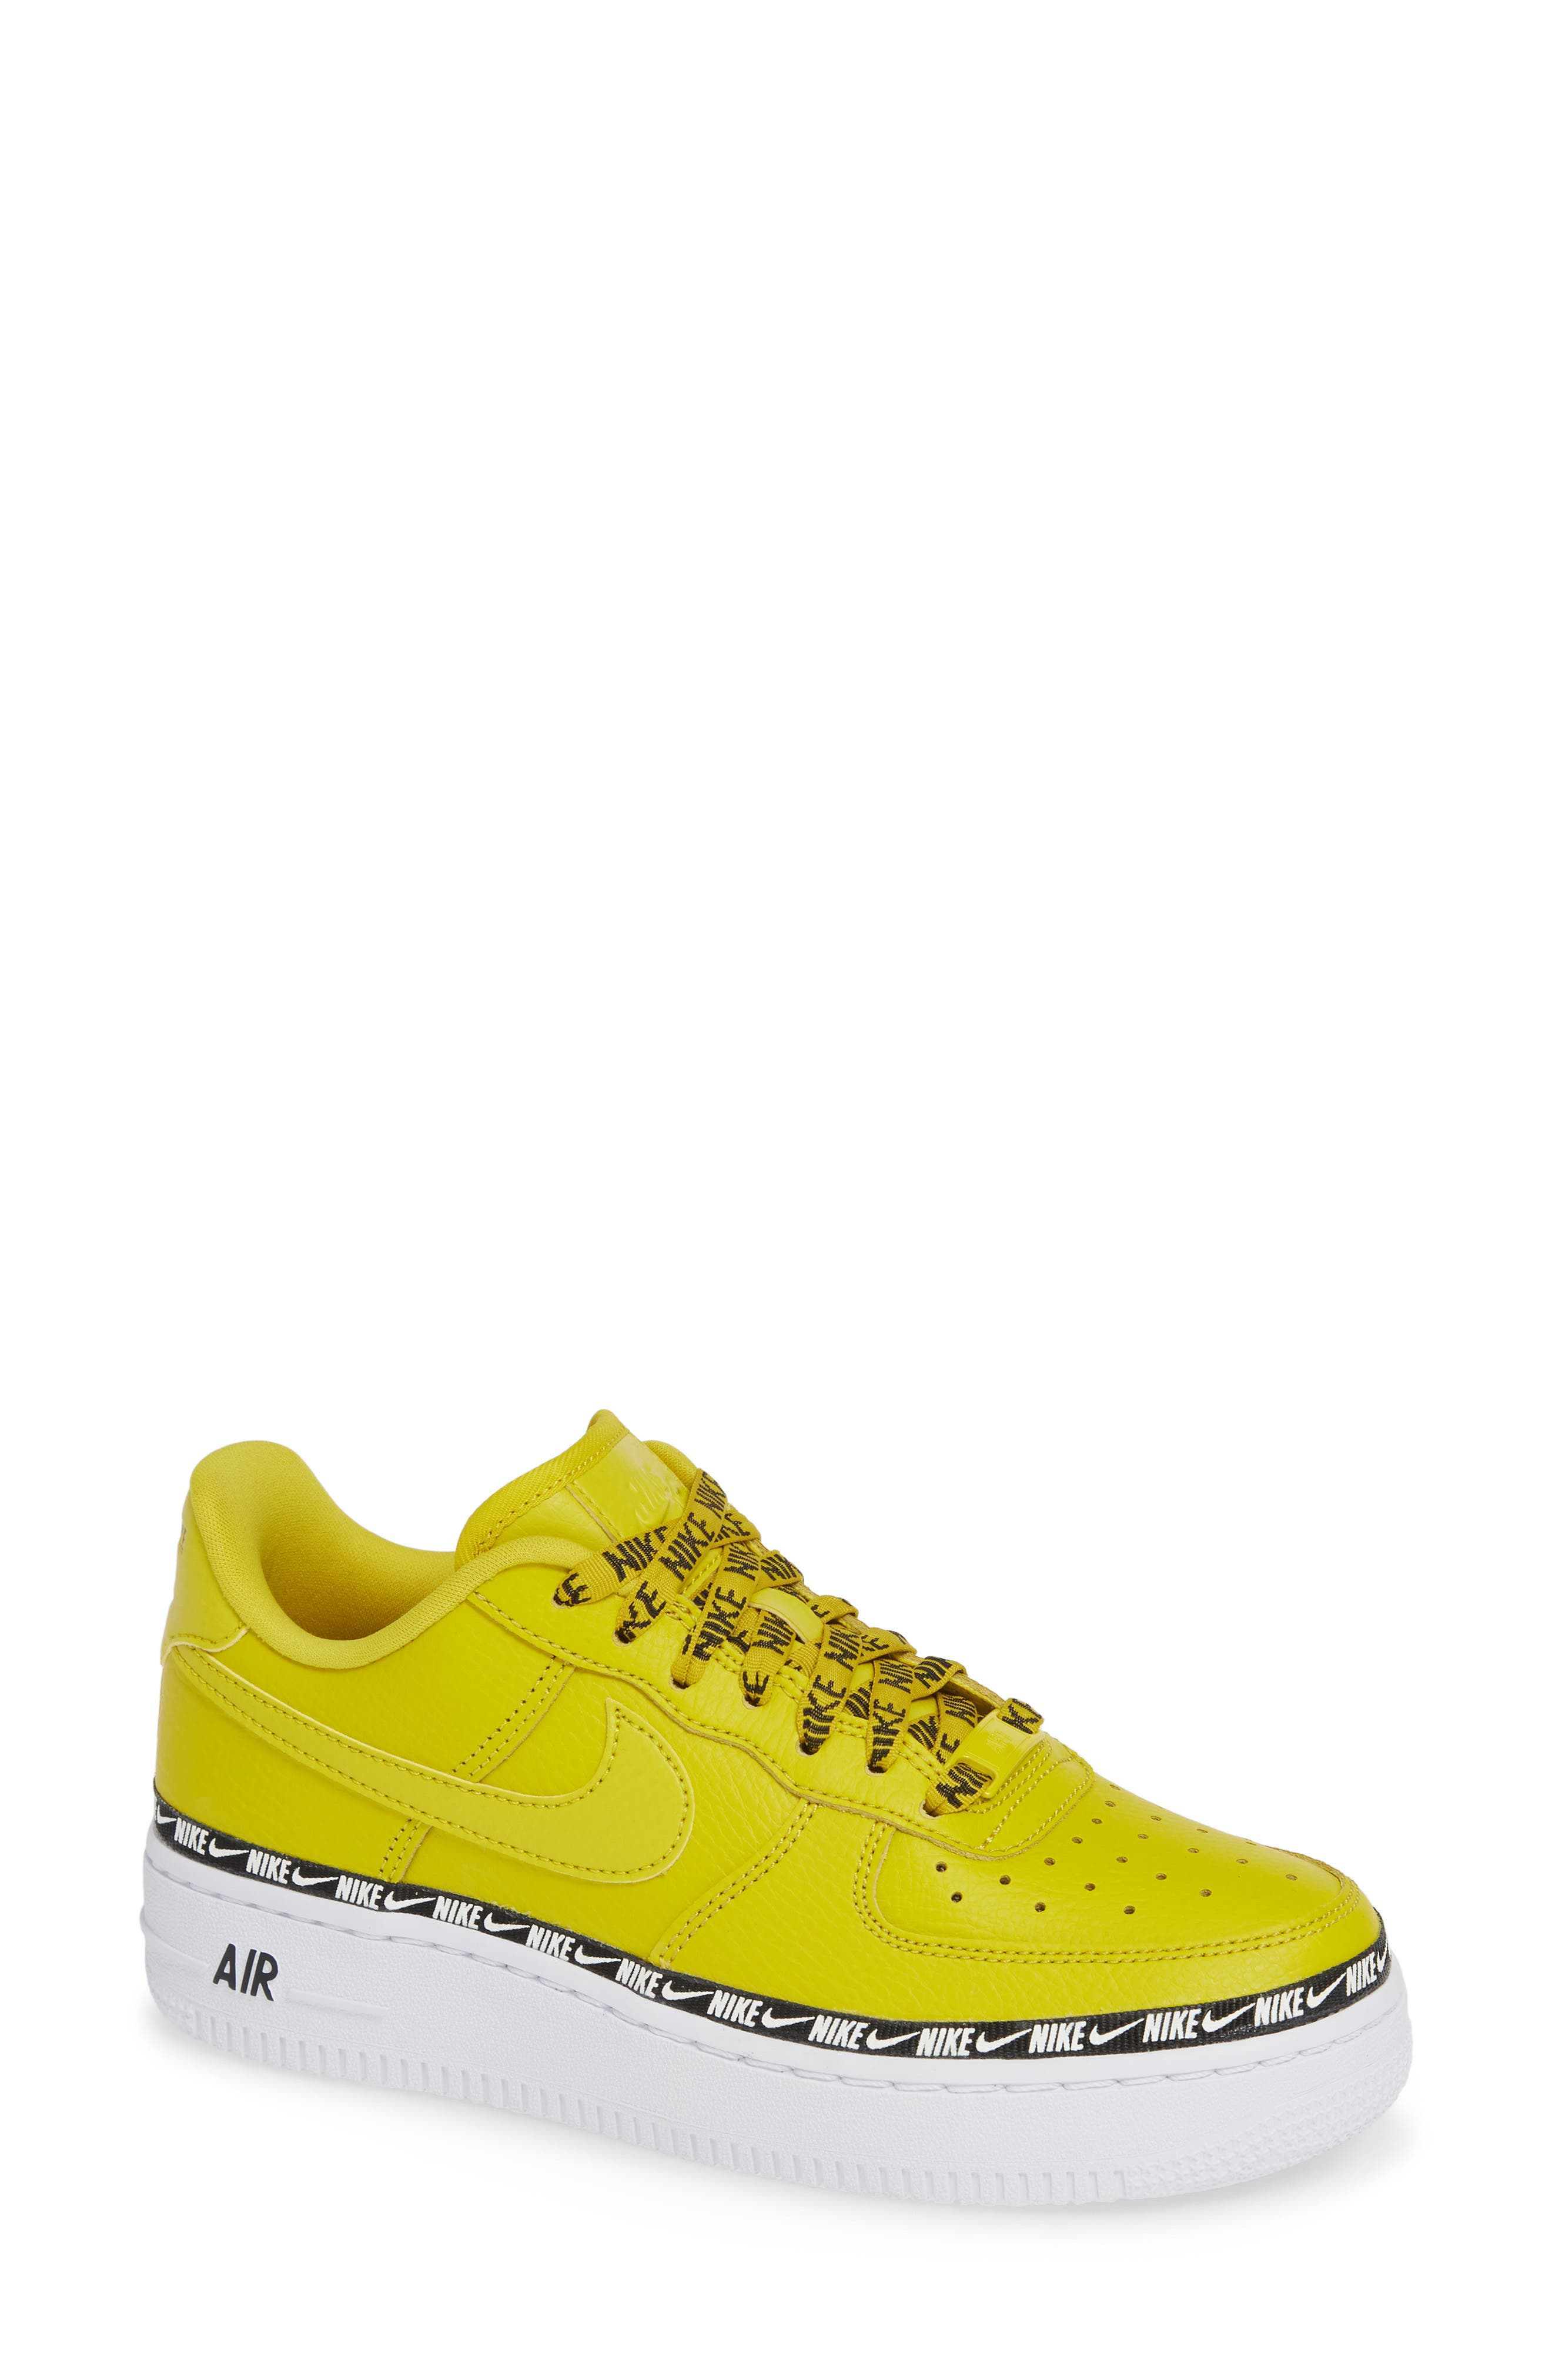 Air Force 1 '07 SE Premium Sneaker,                             Main thumbnail 1, color,                             BRIGHT CITRON/ BLACK/ WHITE